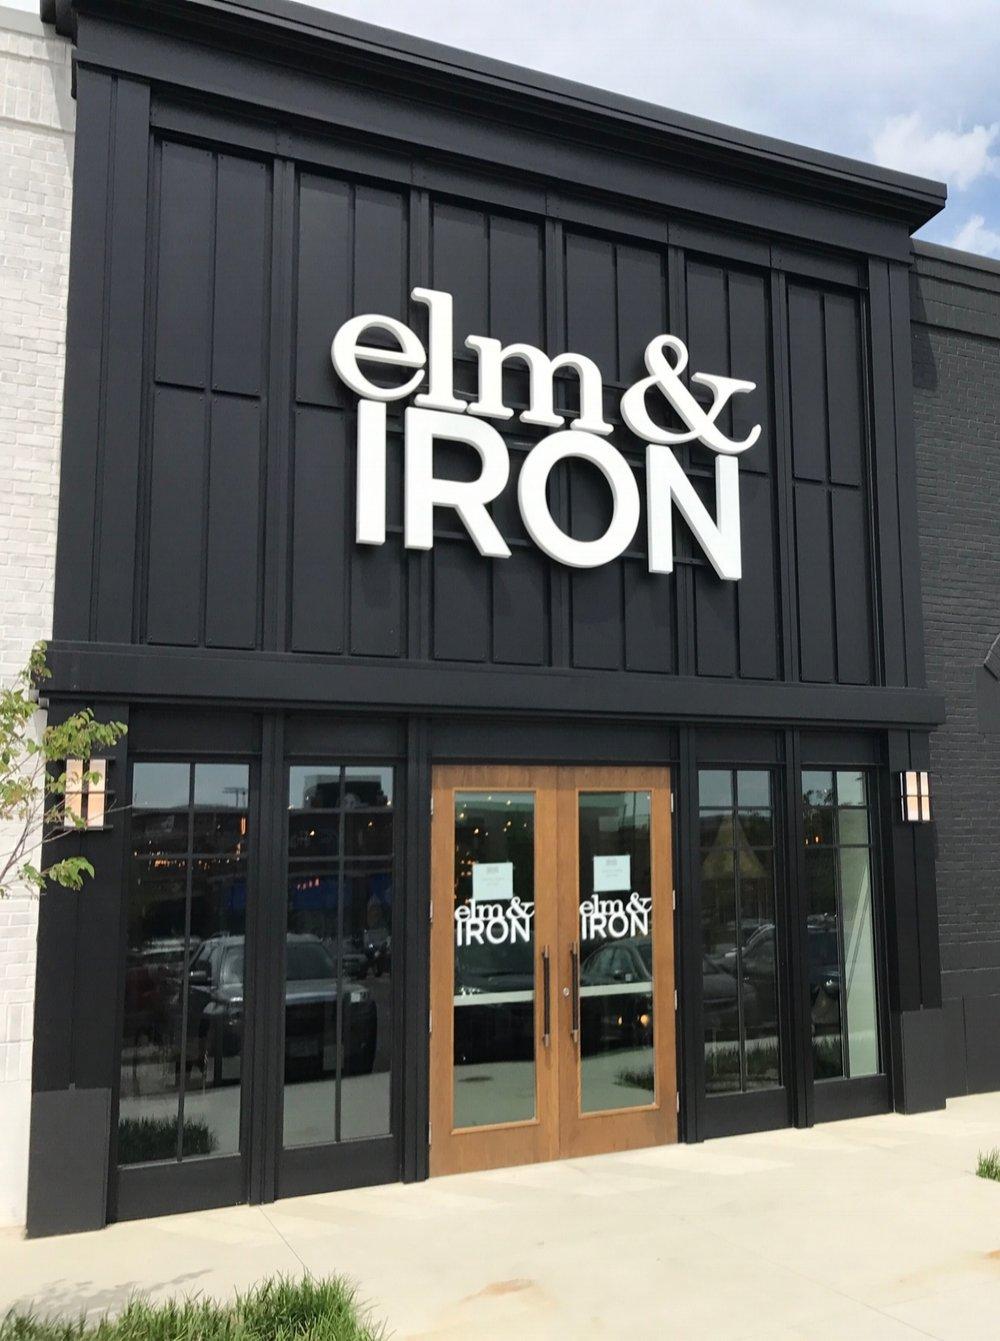 Elm & Iron exterior